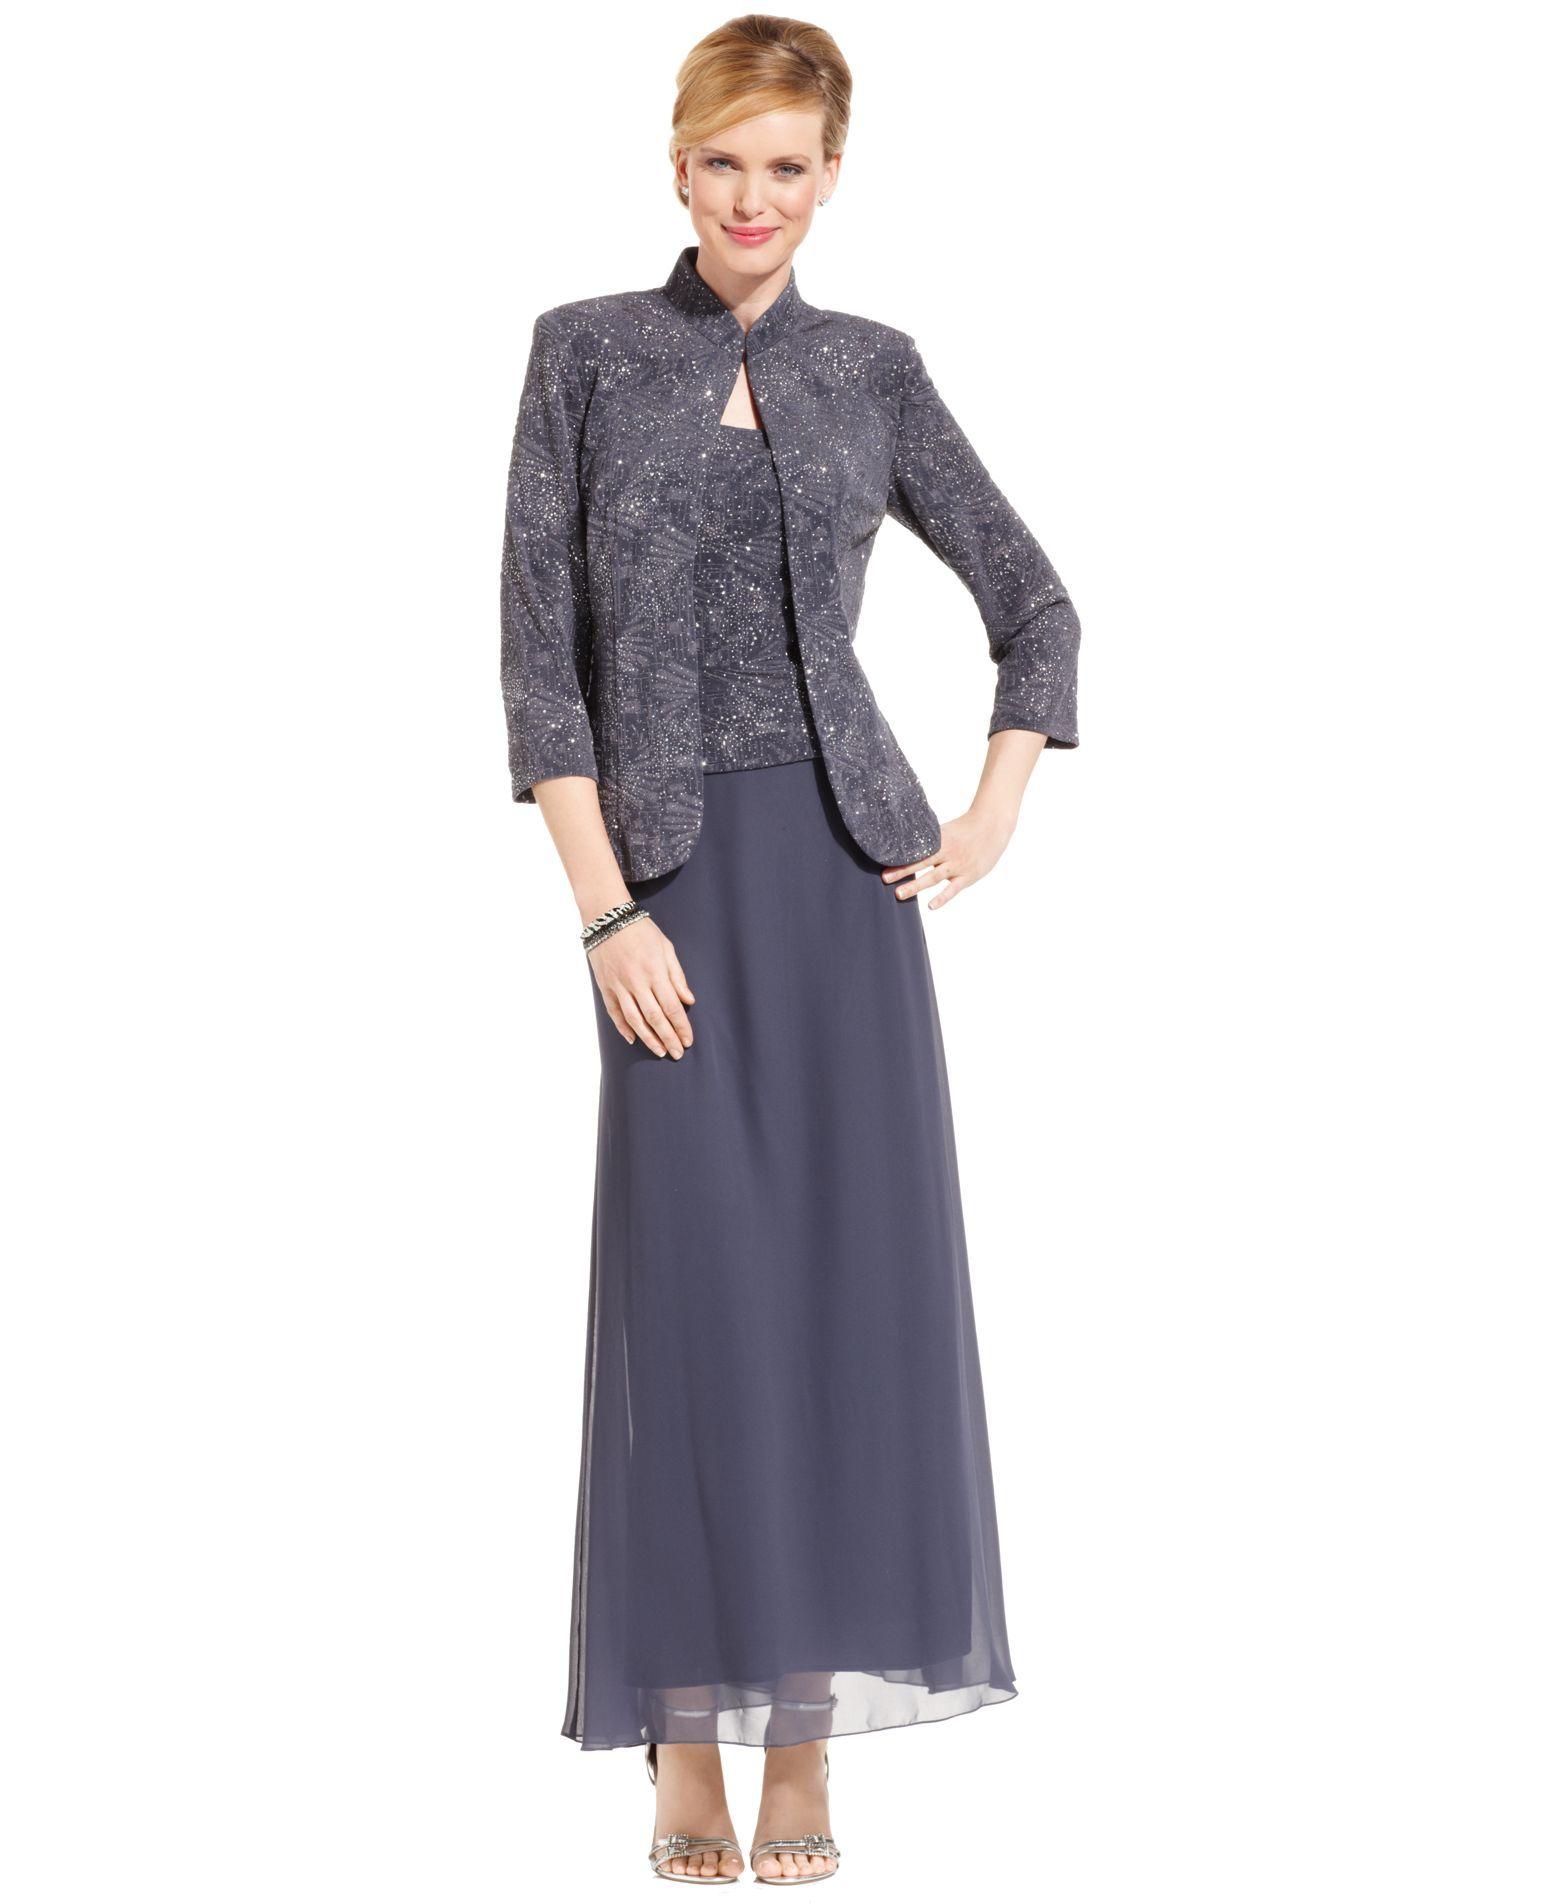 Alex Evenings Dress and Jacket, Sleeveless Jacquard Sparkle Evening ...